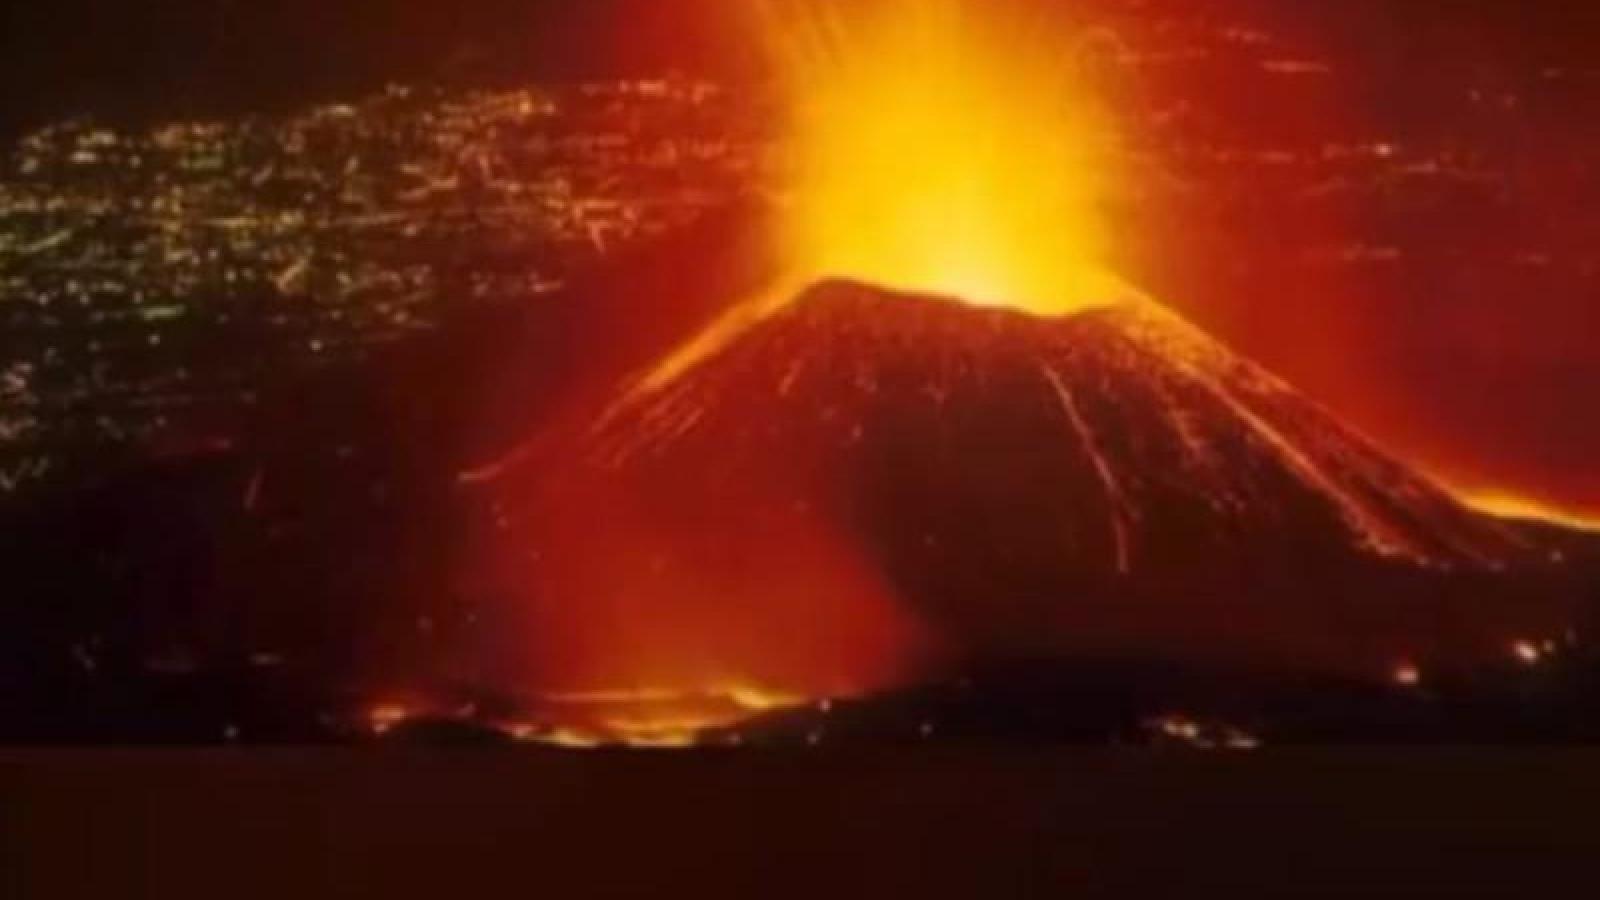 Núi lửa Nyiragongo ở CH Congo phun trào dữ dội